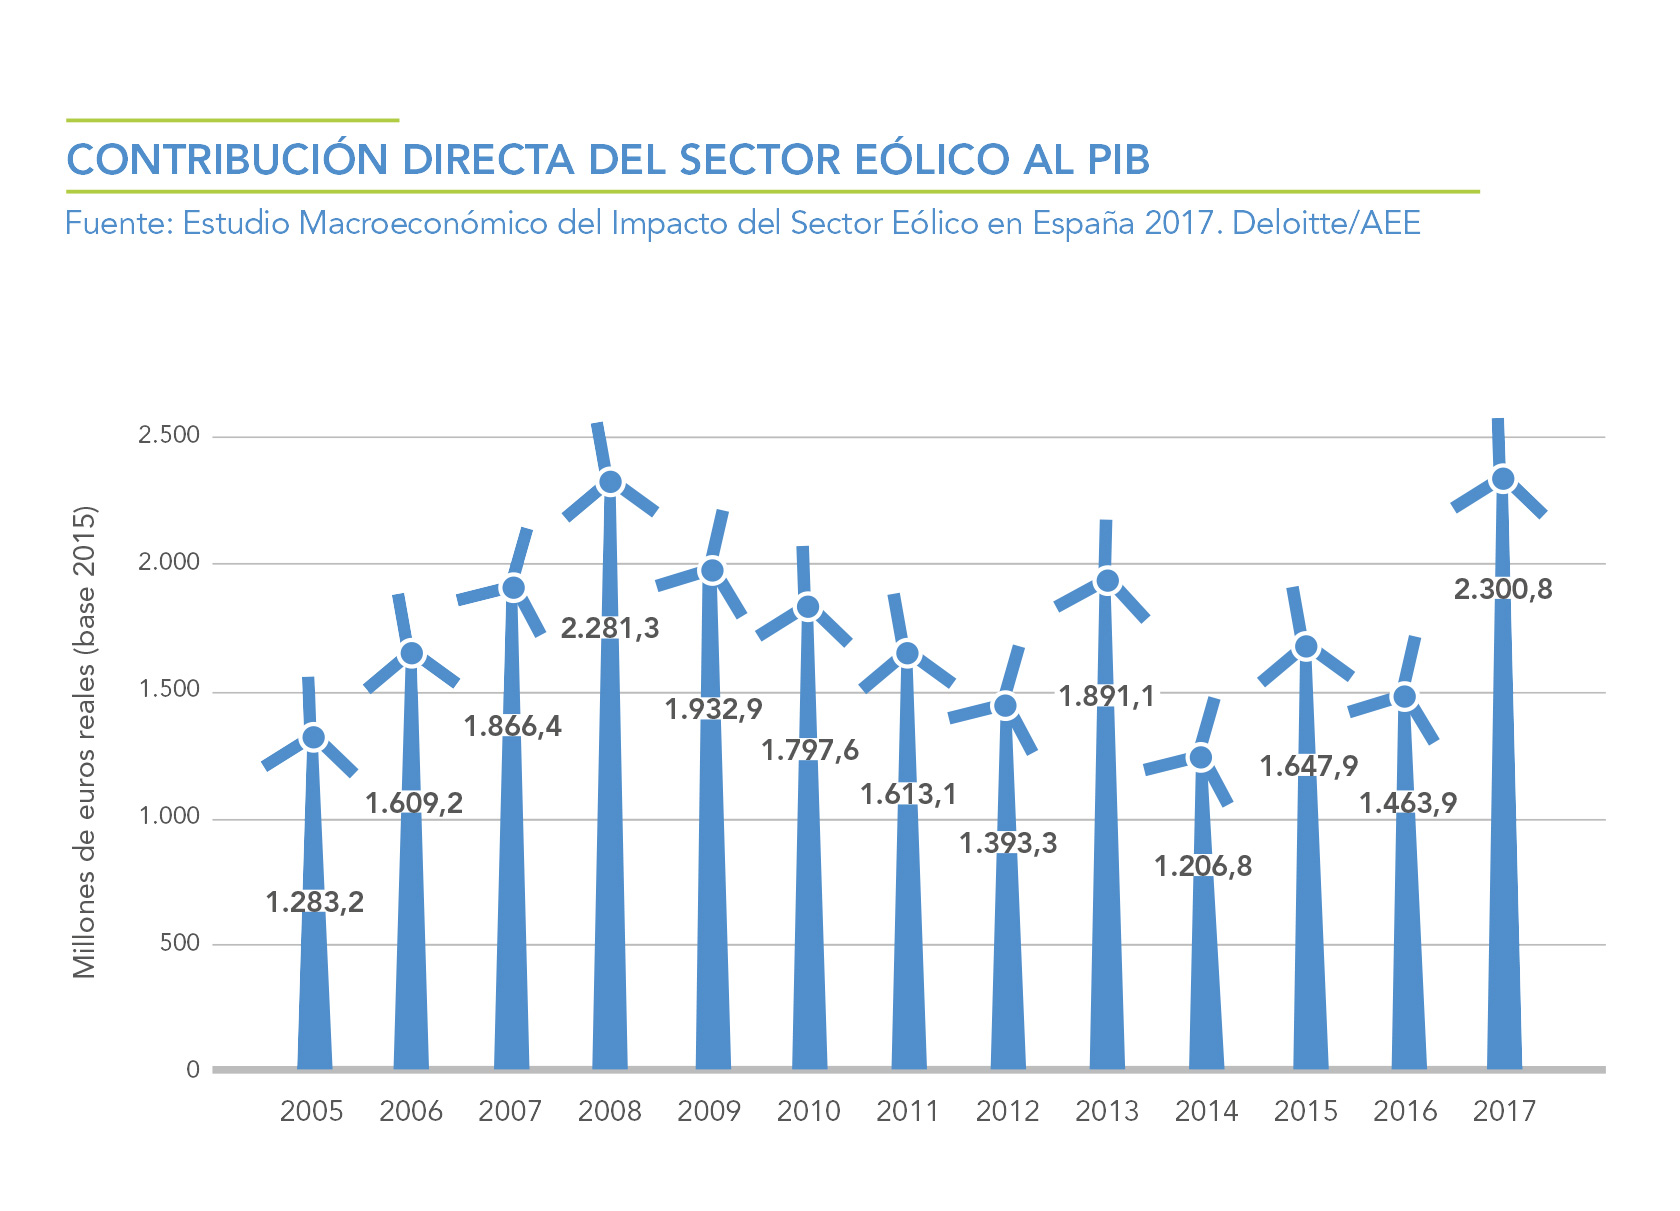 CONTRIBUCION-DIRECTA-DEL-SECTOR-EOLICO-AL-PIB